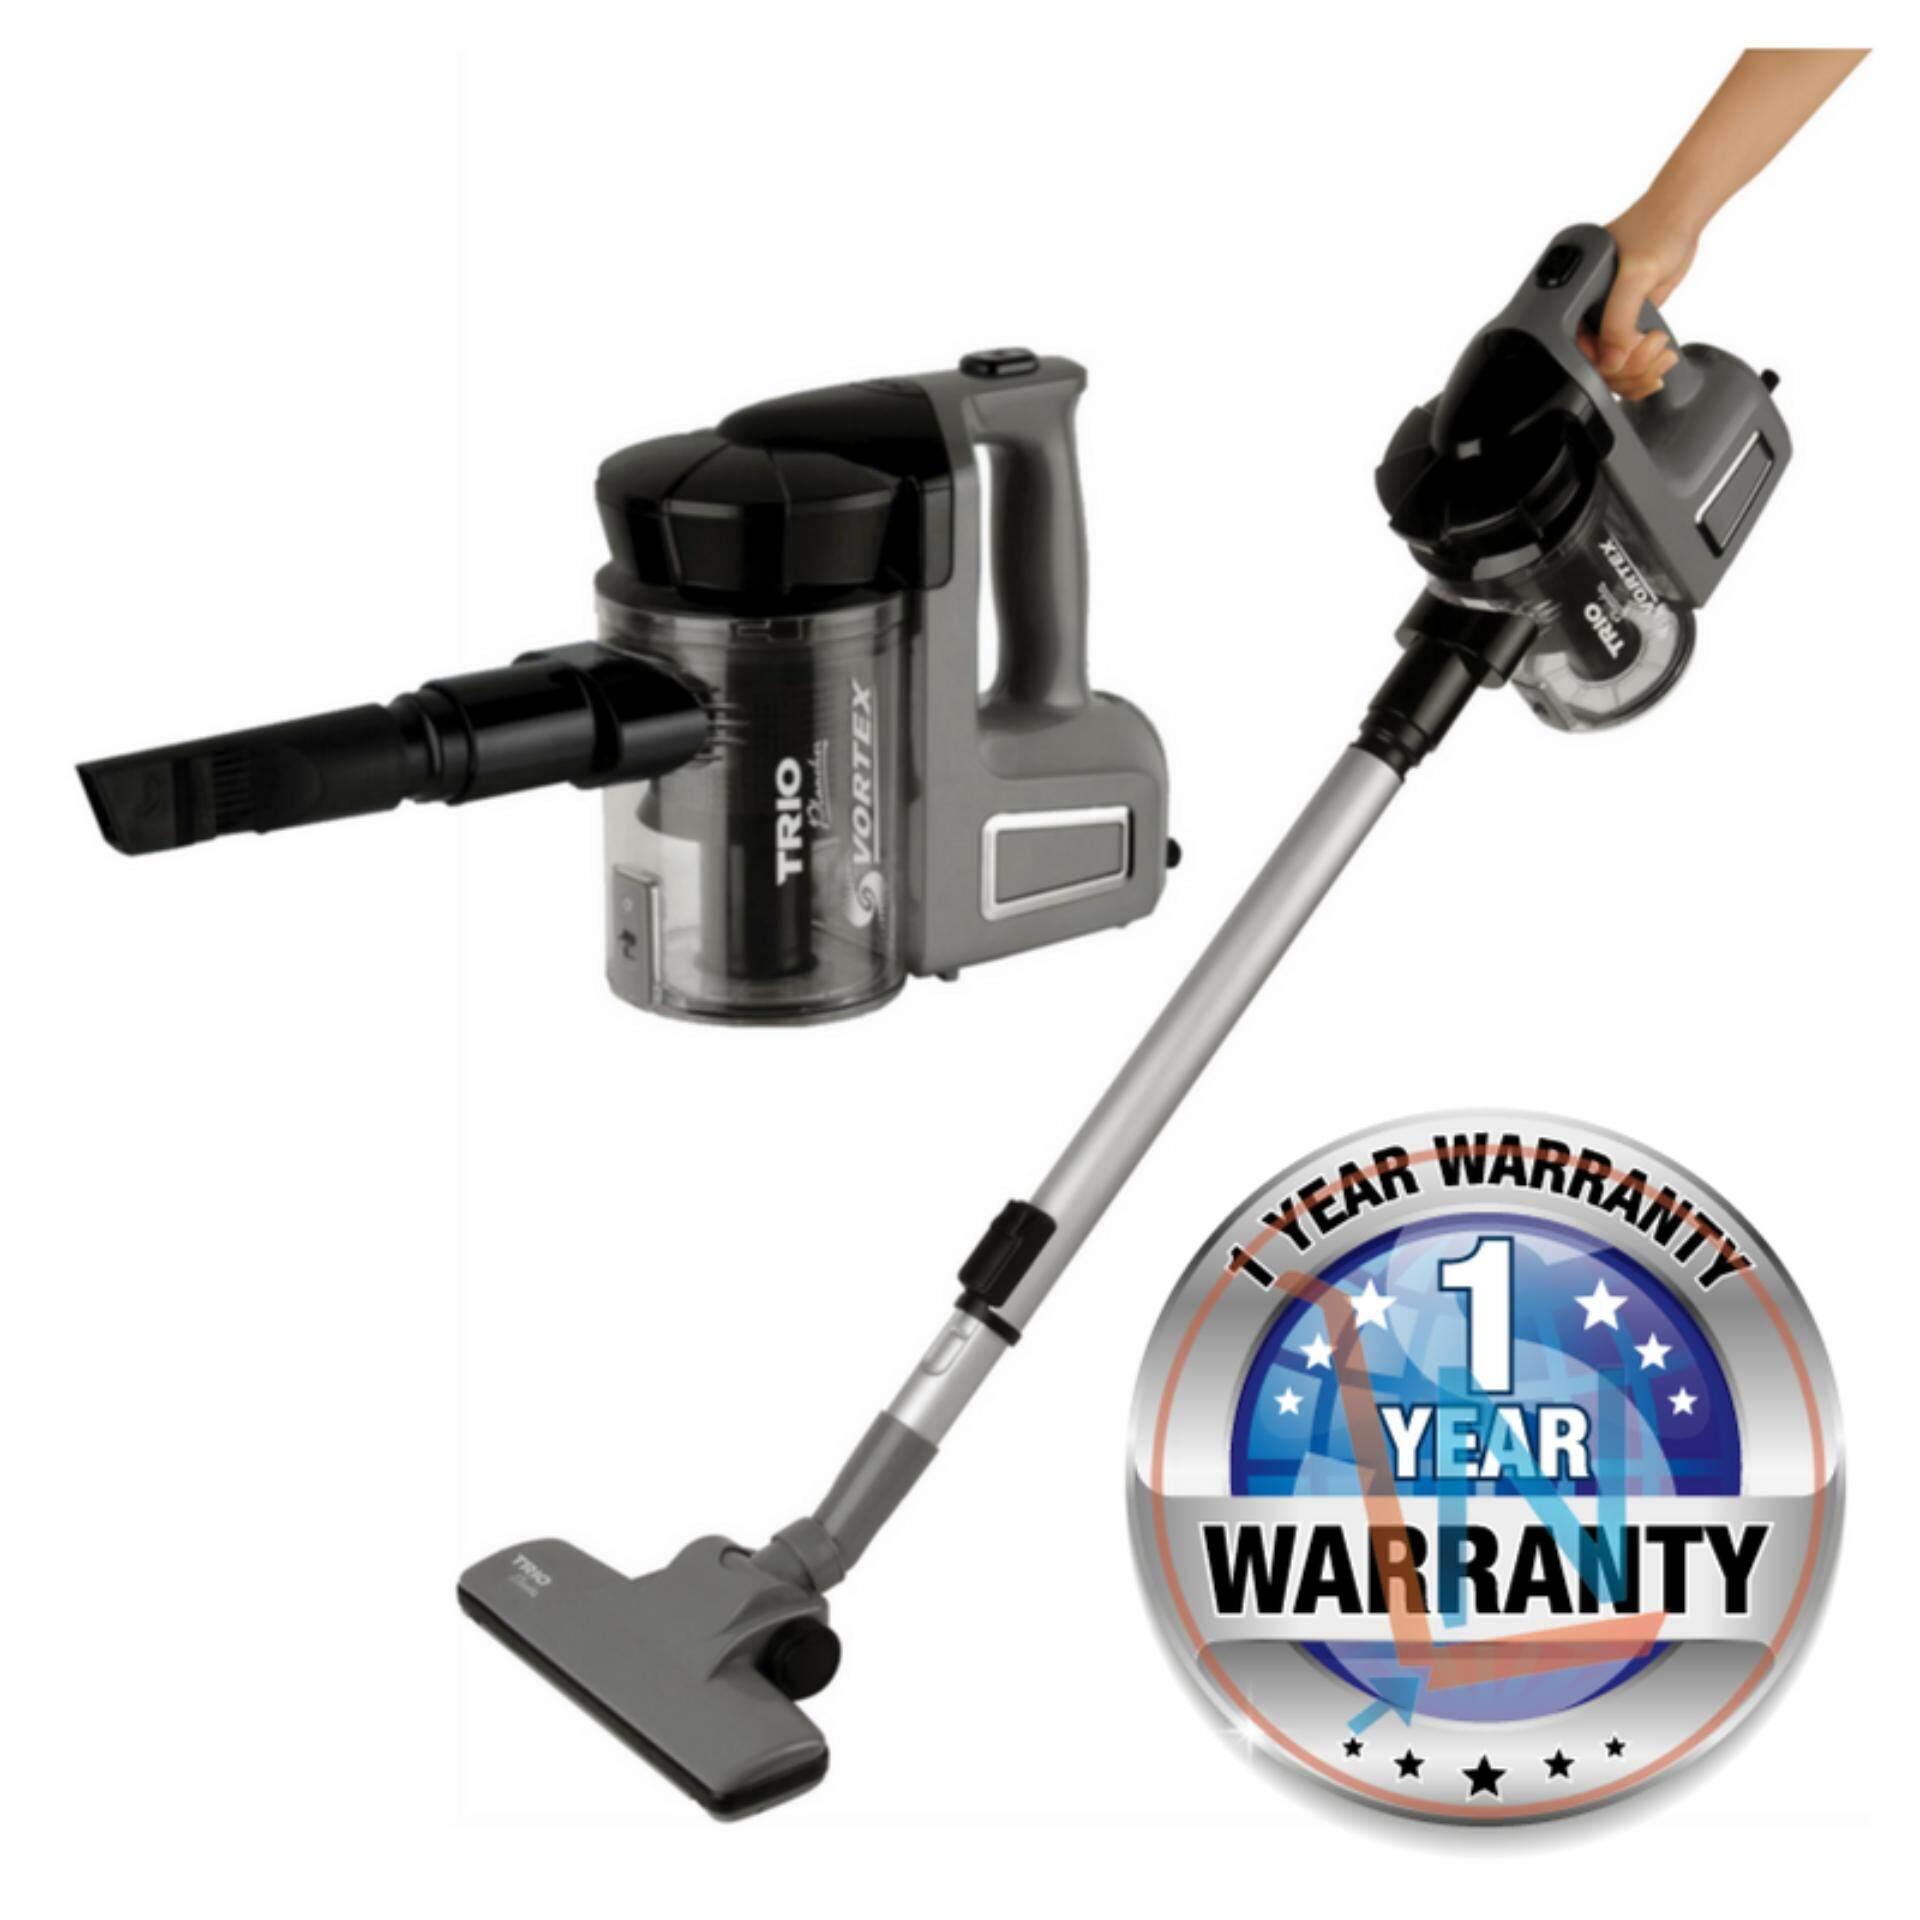 TRIO THC-627 2-in-1 Handheld Vacuum Cleaner (Black/Grey)